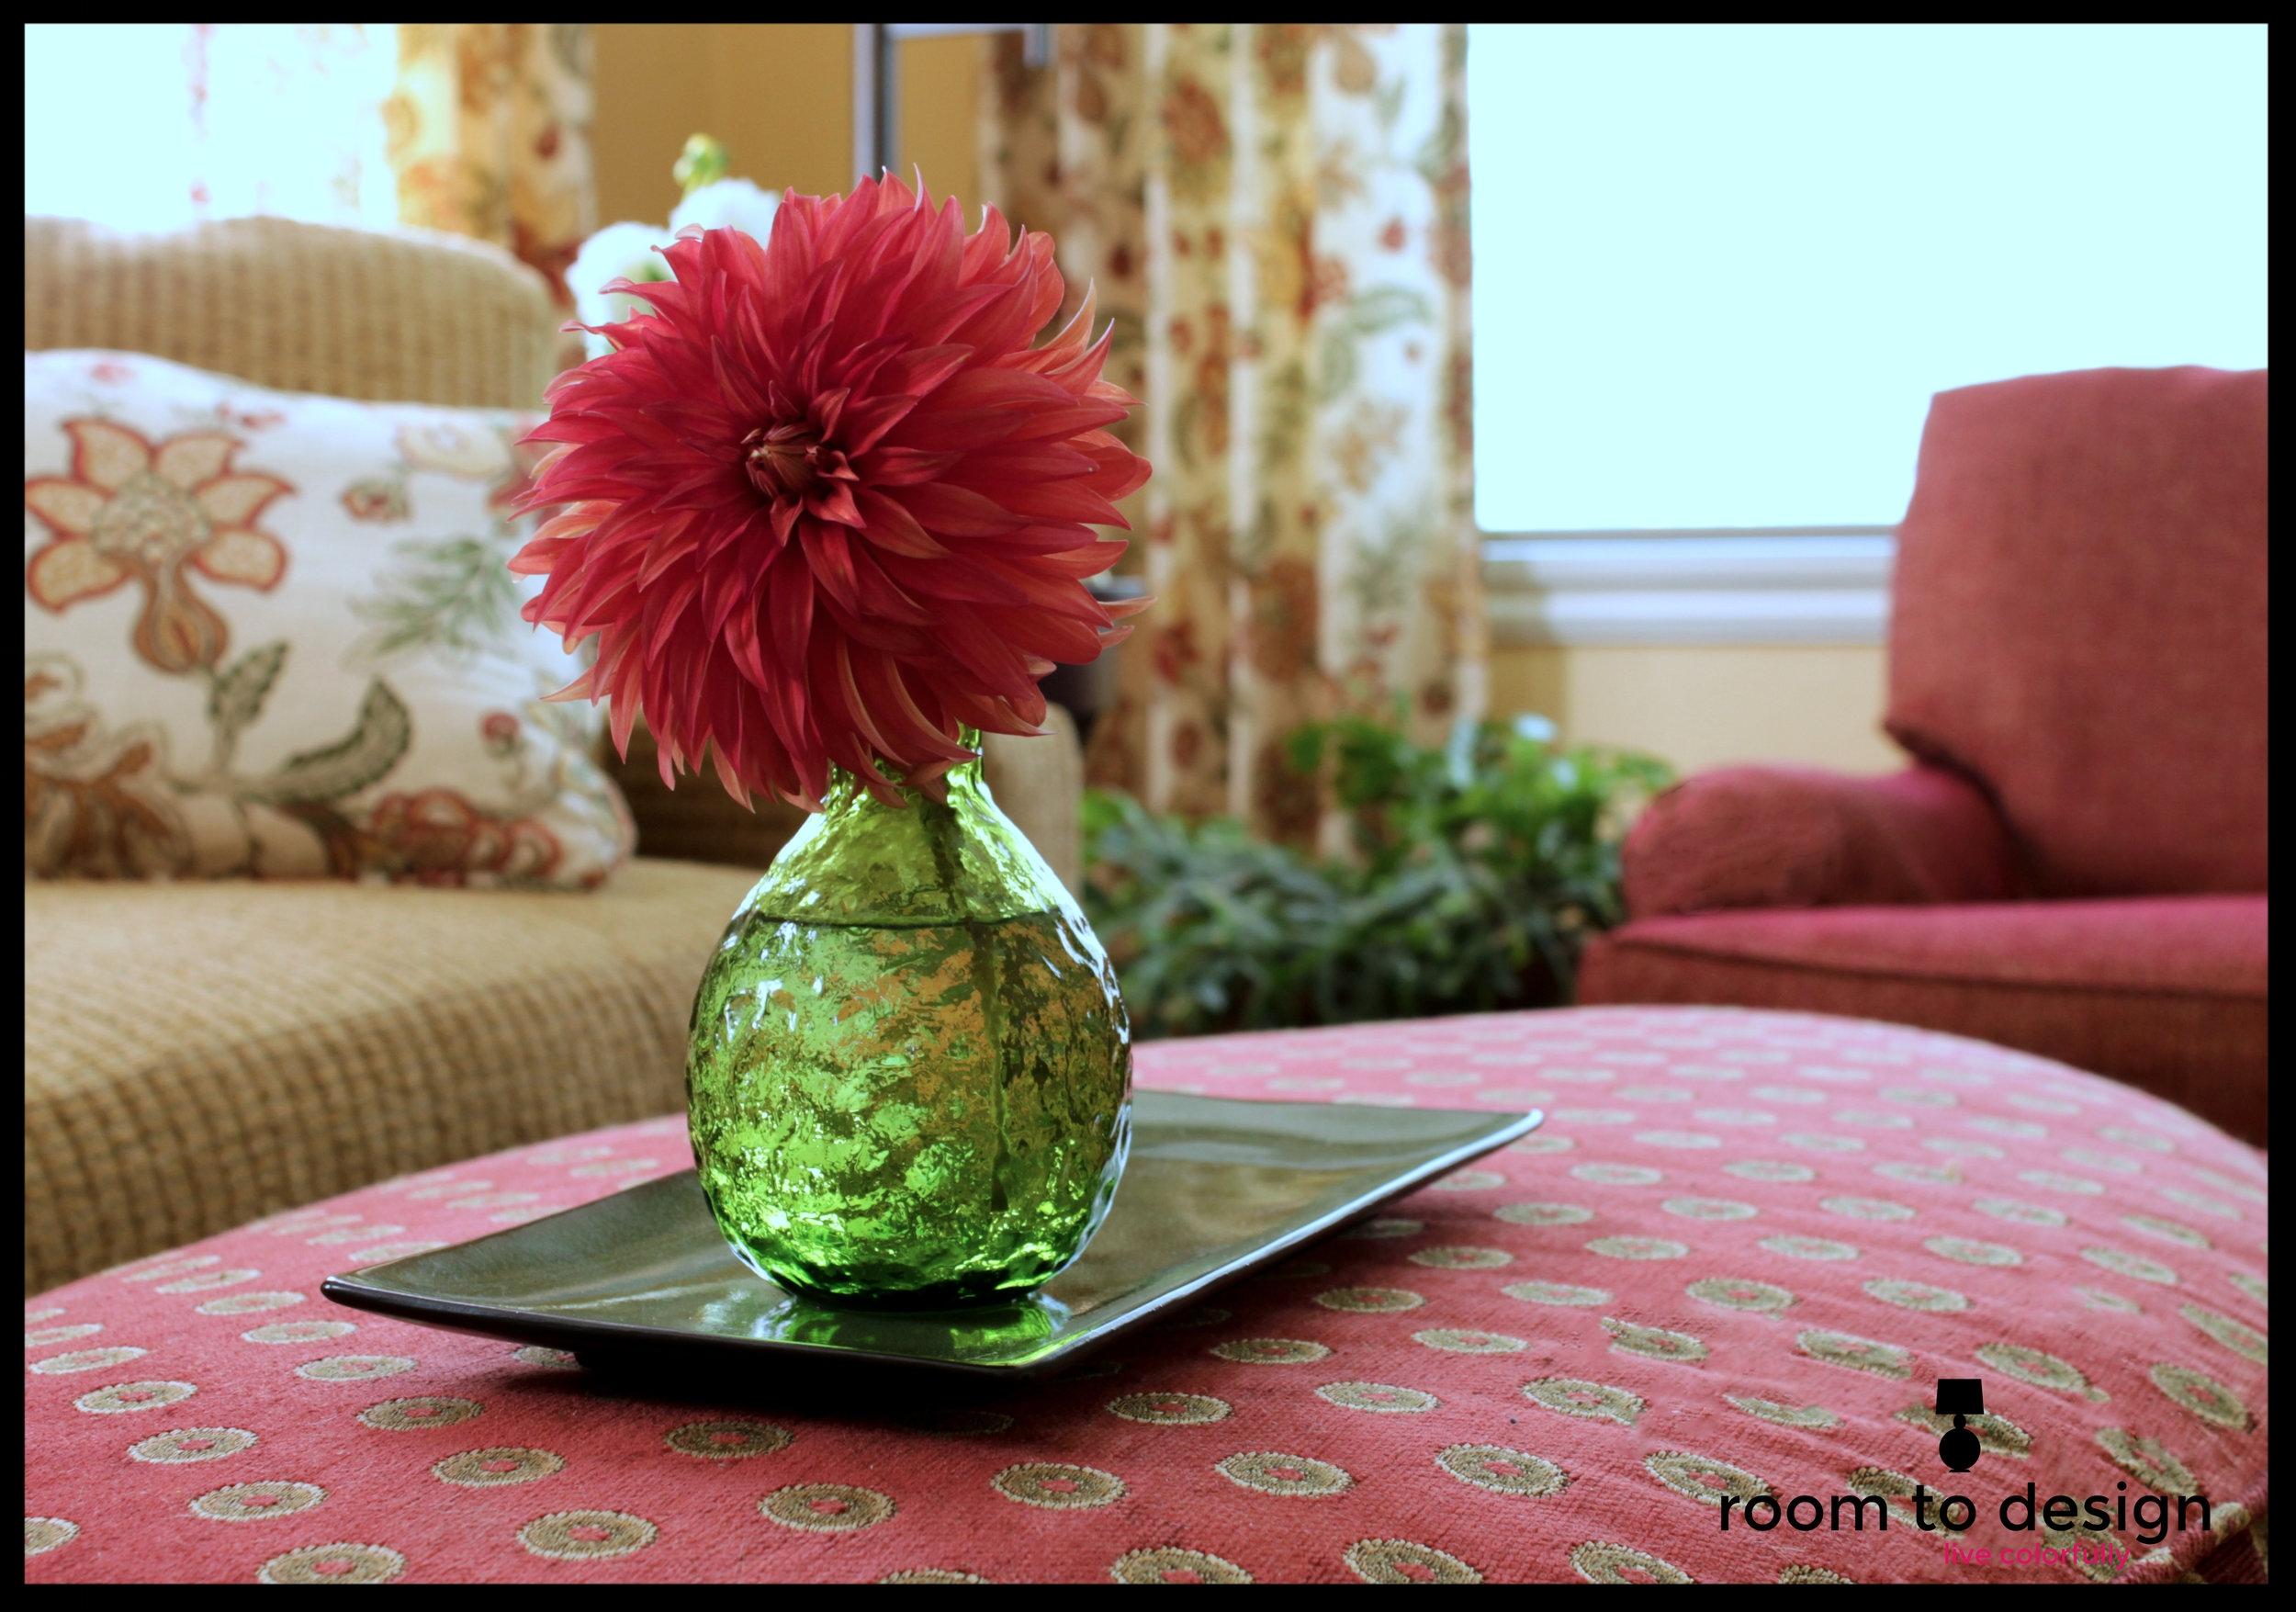 seattle_living_room_ideas2.jpg